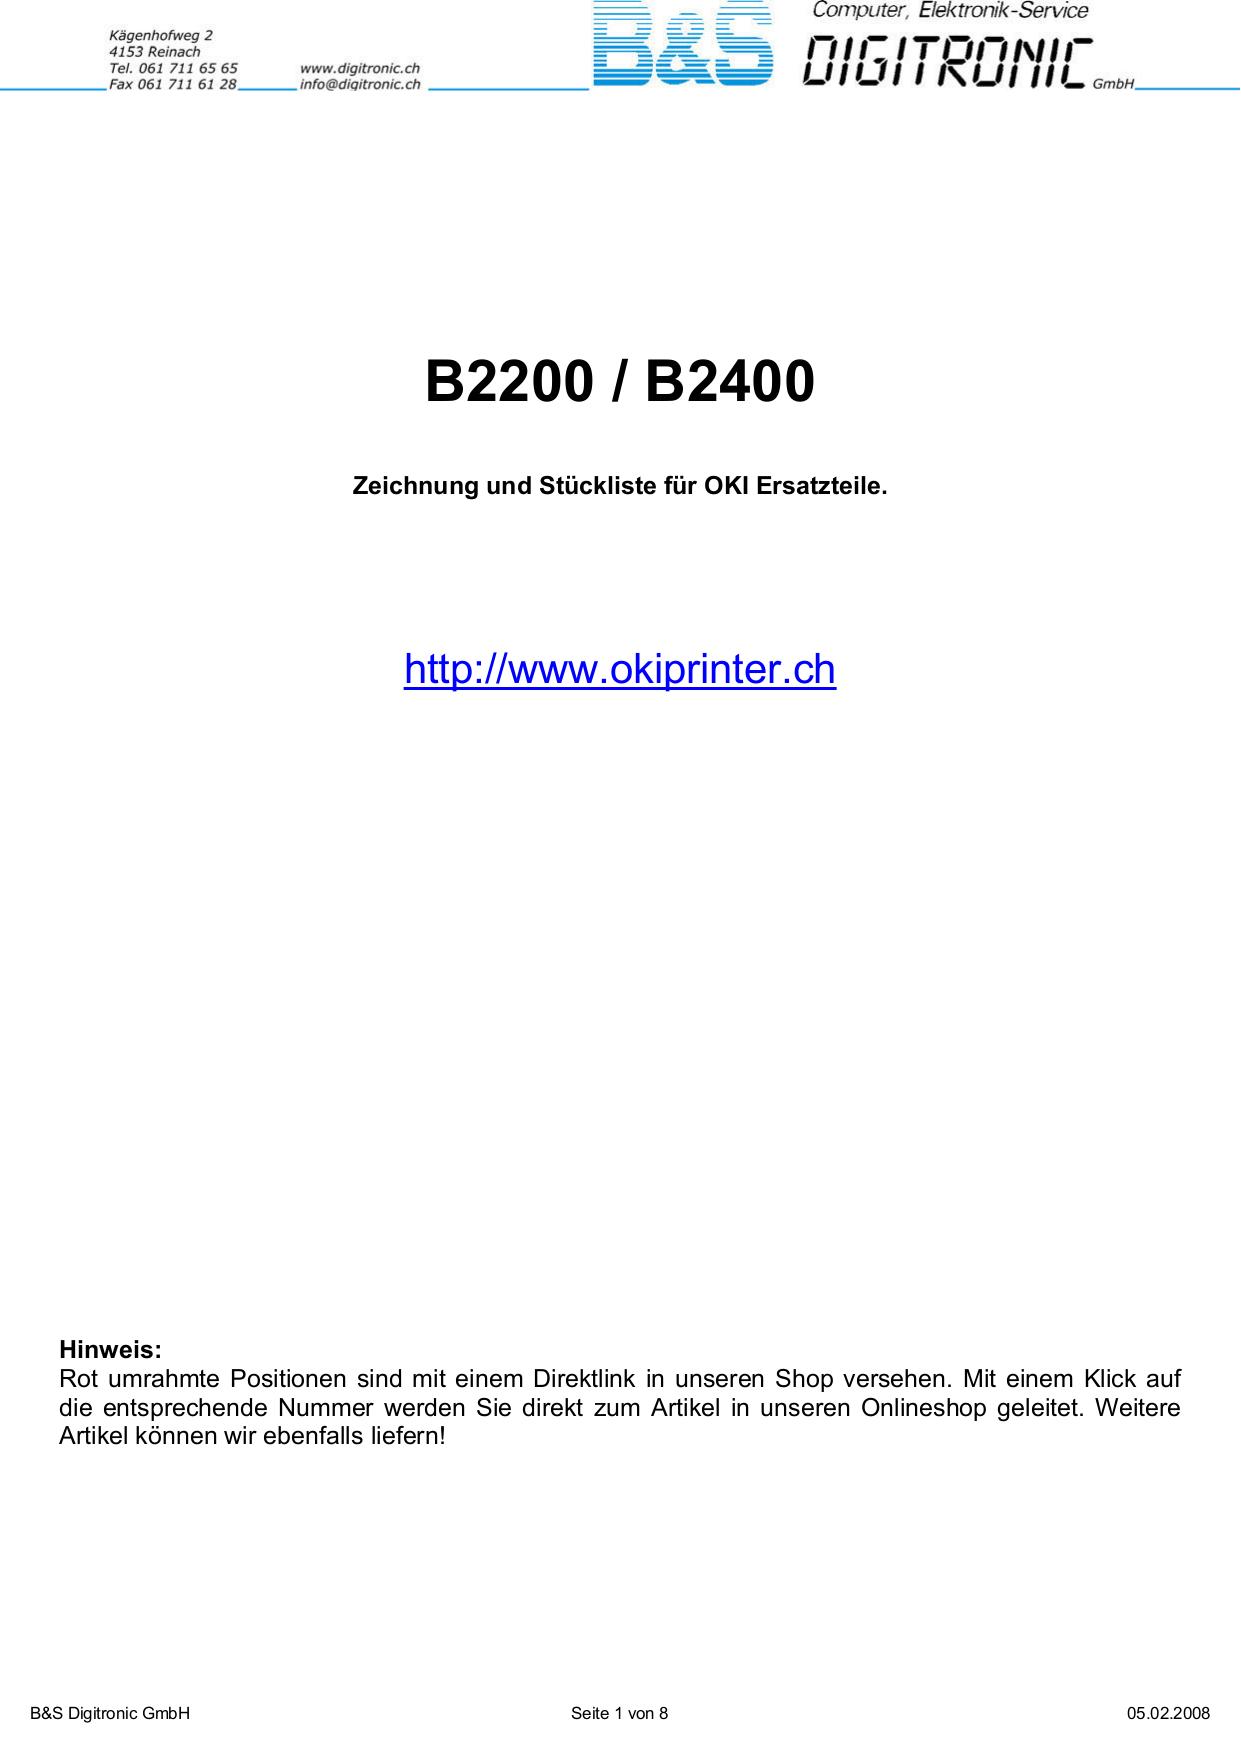 Oki b2200 принтер инструкция